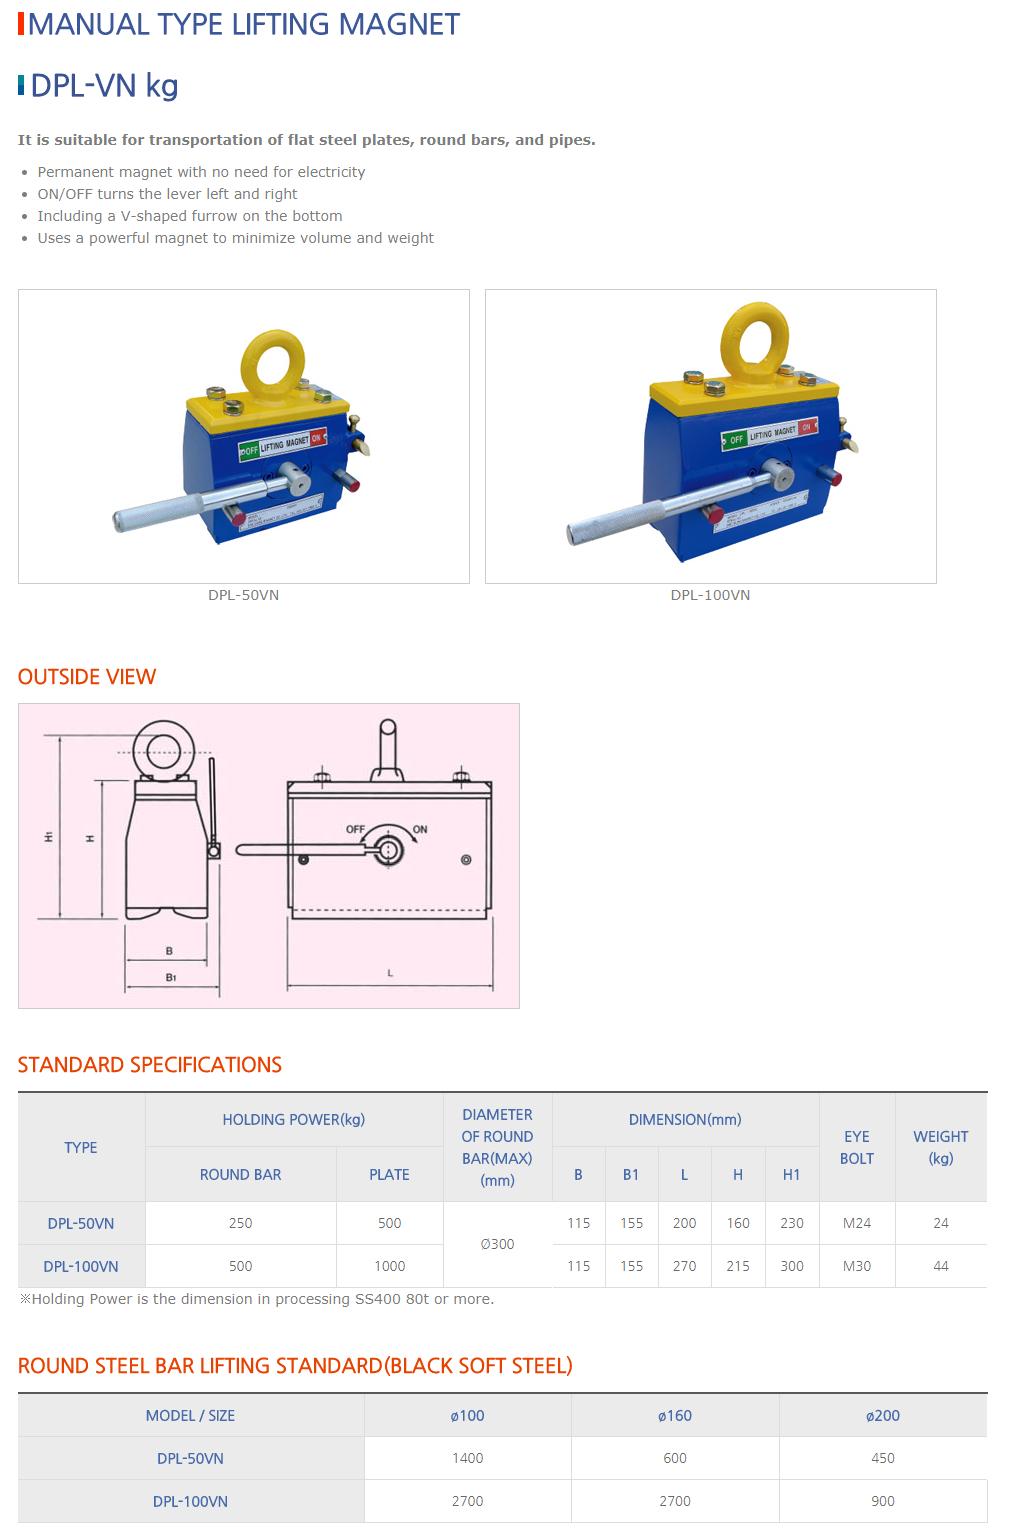 DAESUNG MARGNET Manual Type Lifting Magnet DPL-VN kg Type